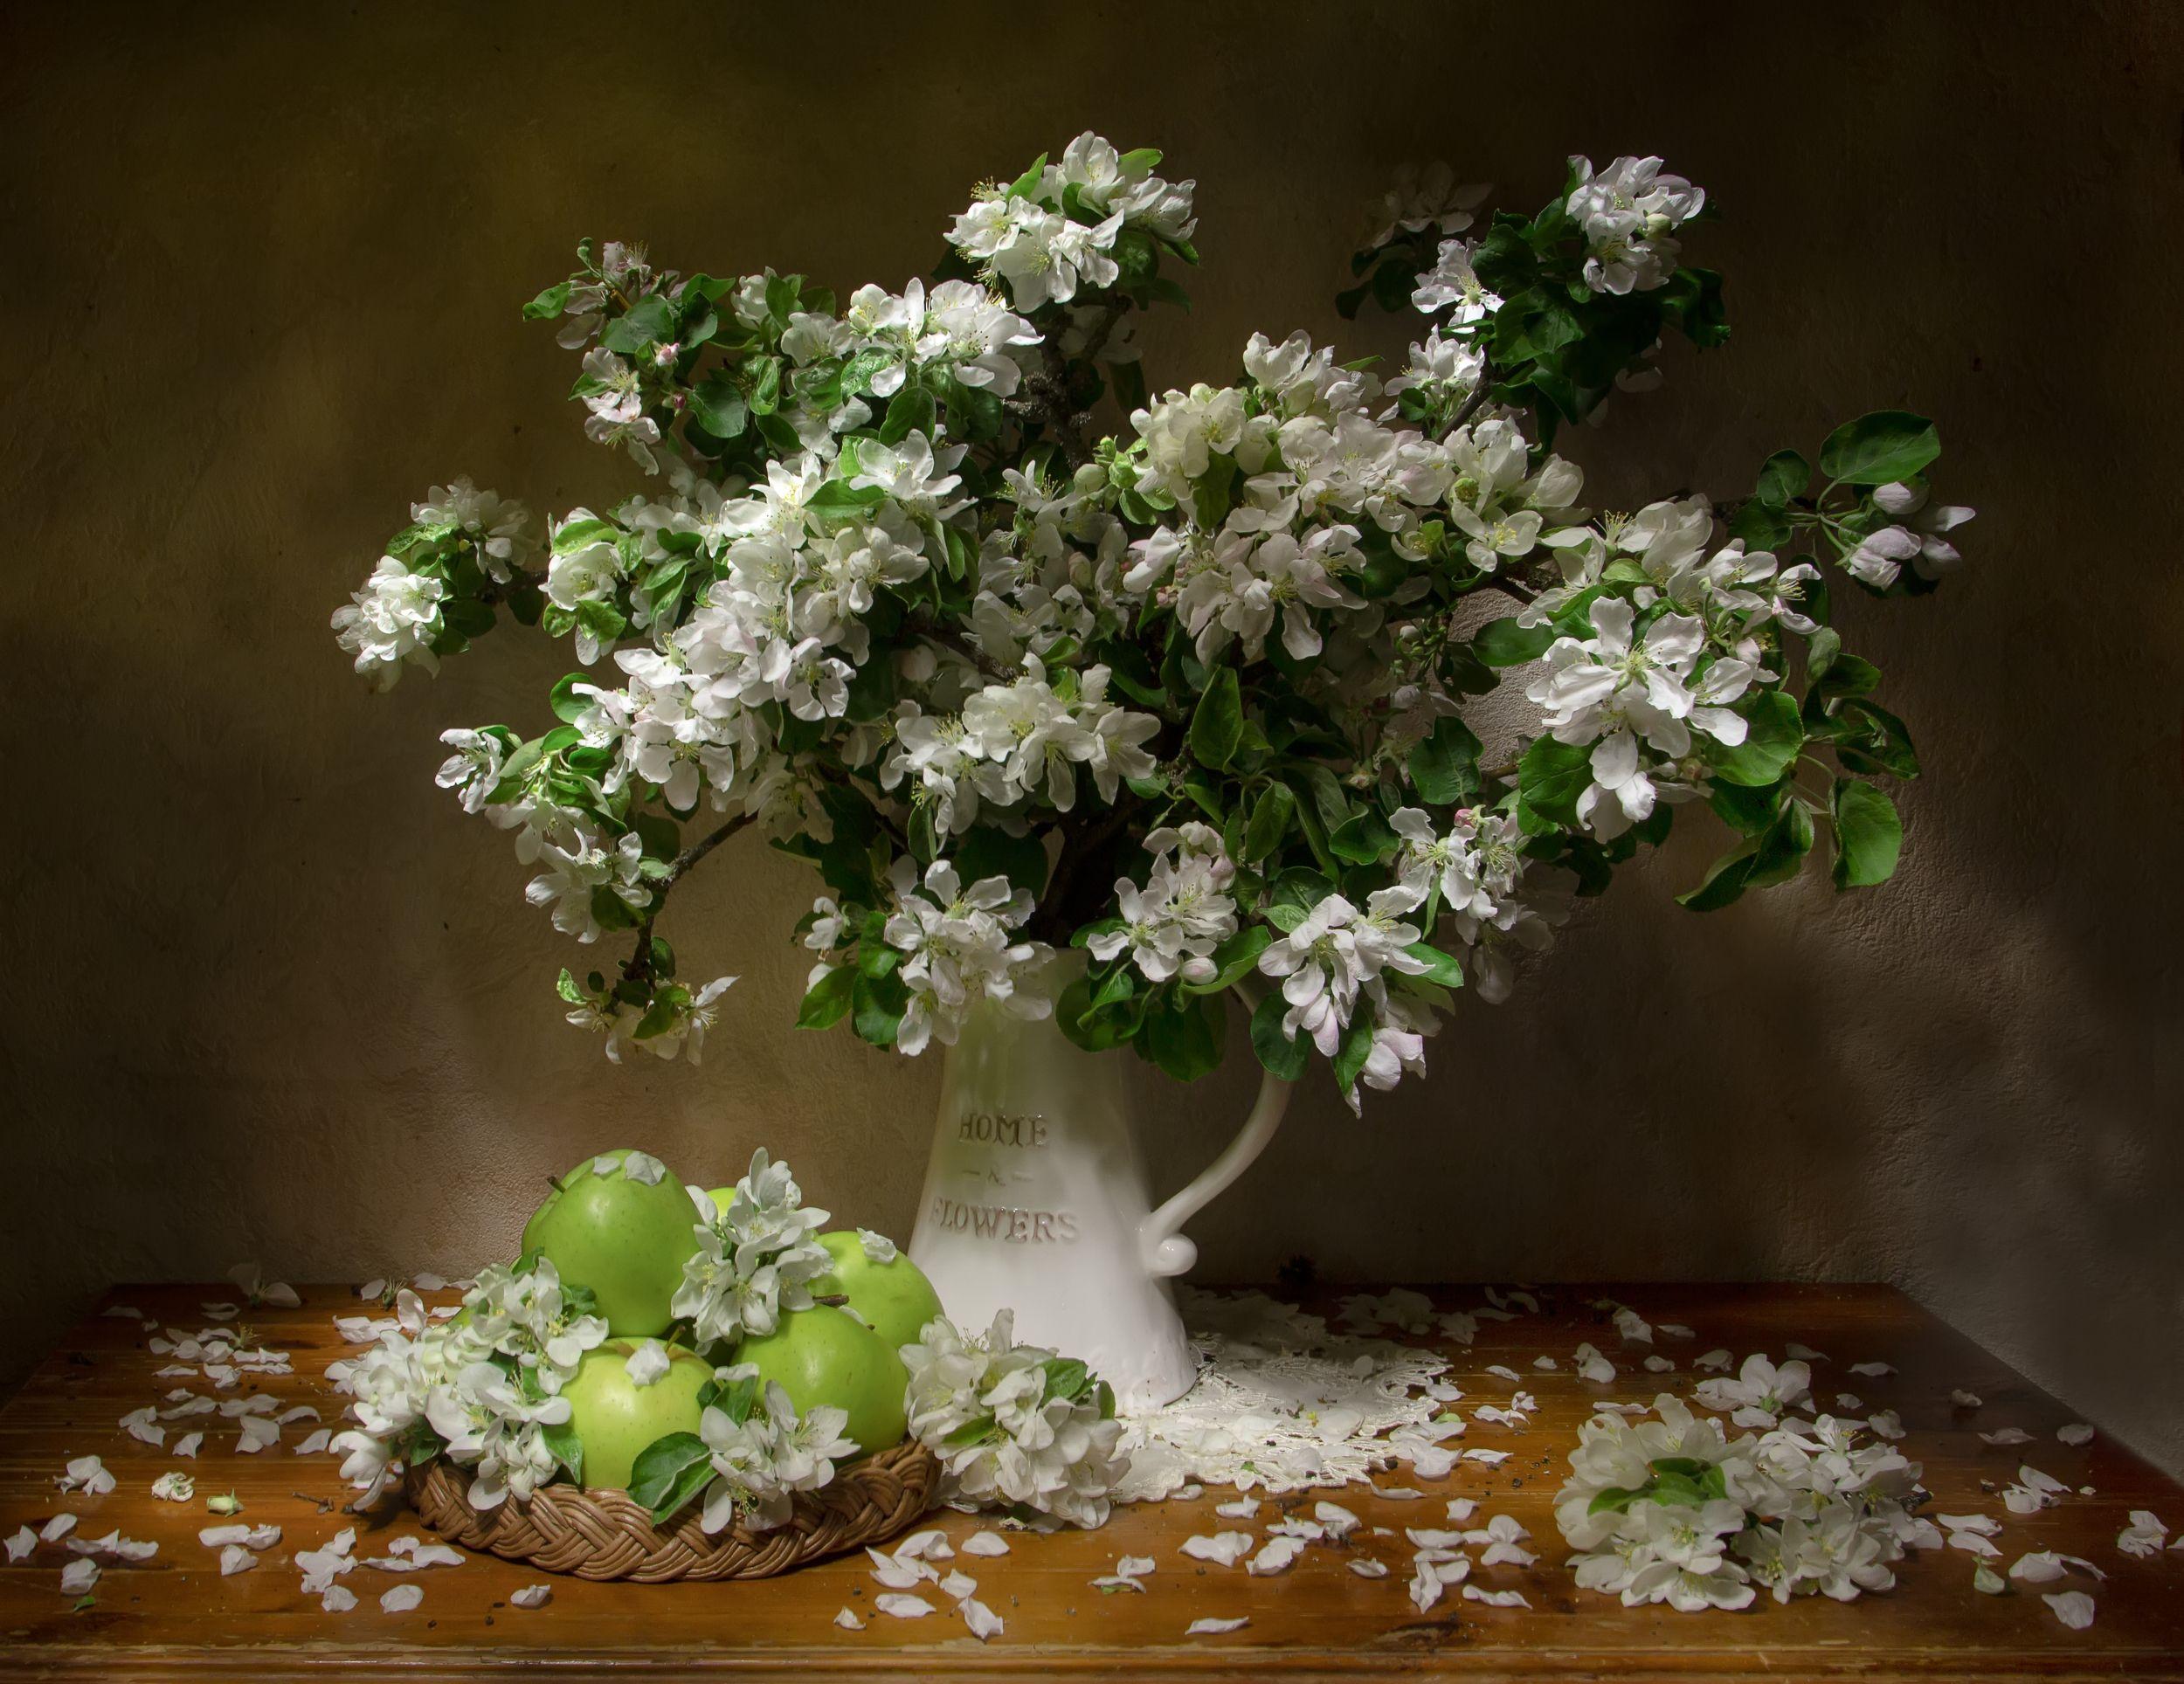 натюрморт. яблоня цвтет, яблоня, цветет, яблоко, яблоки, Феденкова Татьяна